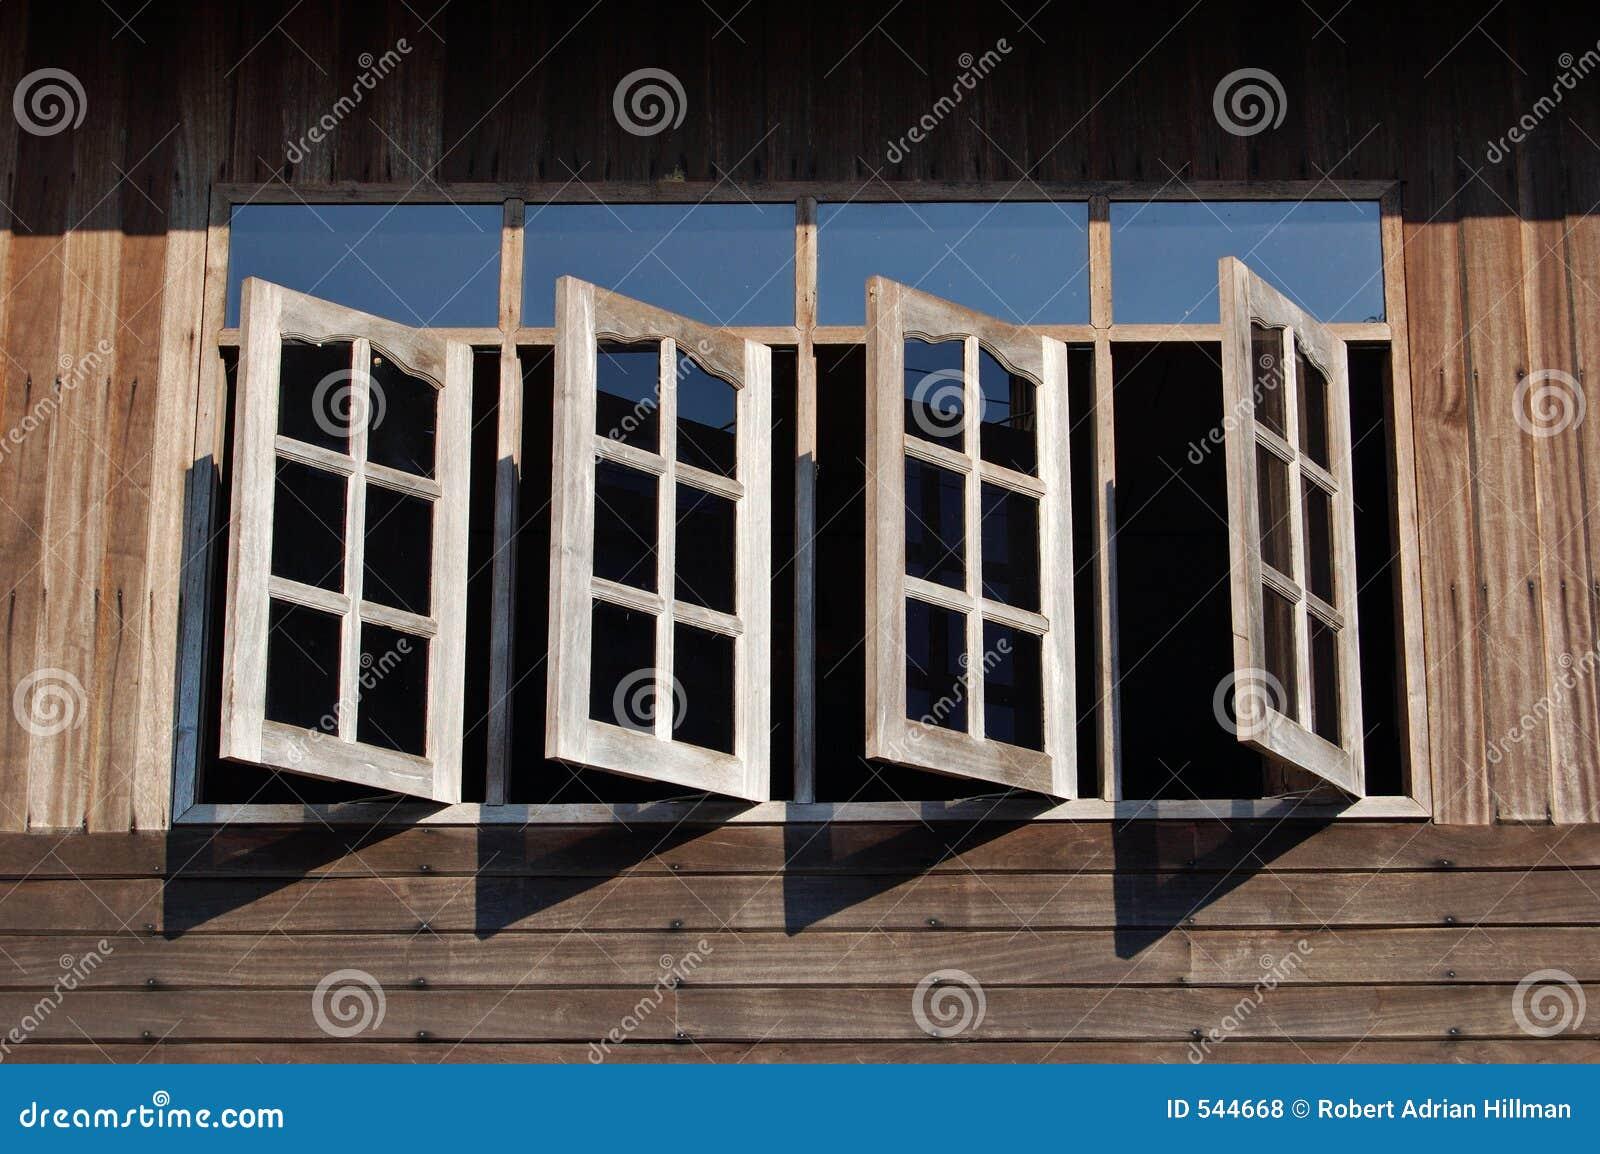 Download 开窗口 库存照片. 图片 包括有 影子, 开放, 证券, 木头, 阳光, 开放性, 房子, 视窗, 偏锋, 线路 - 544668